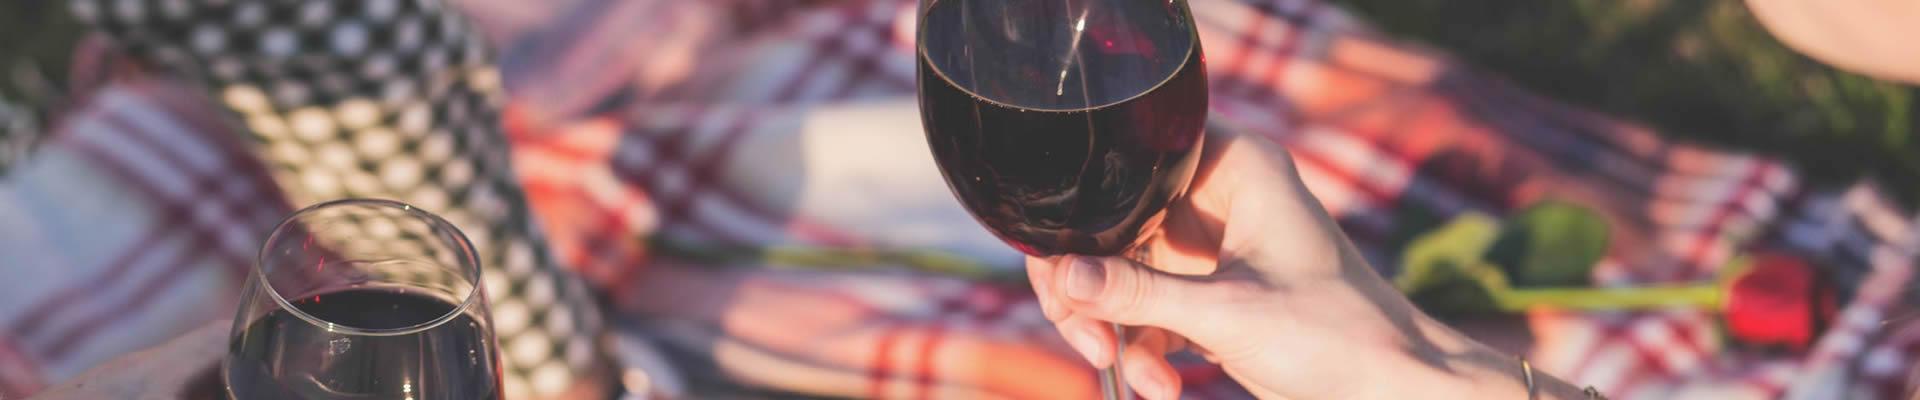 Rioja wine enjoyed on a picnic